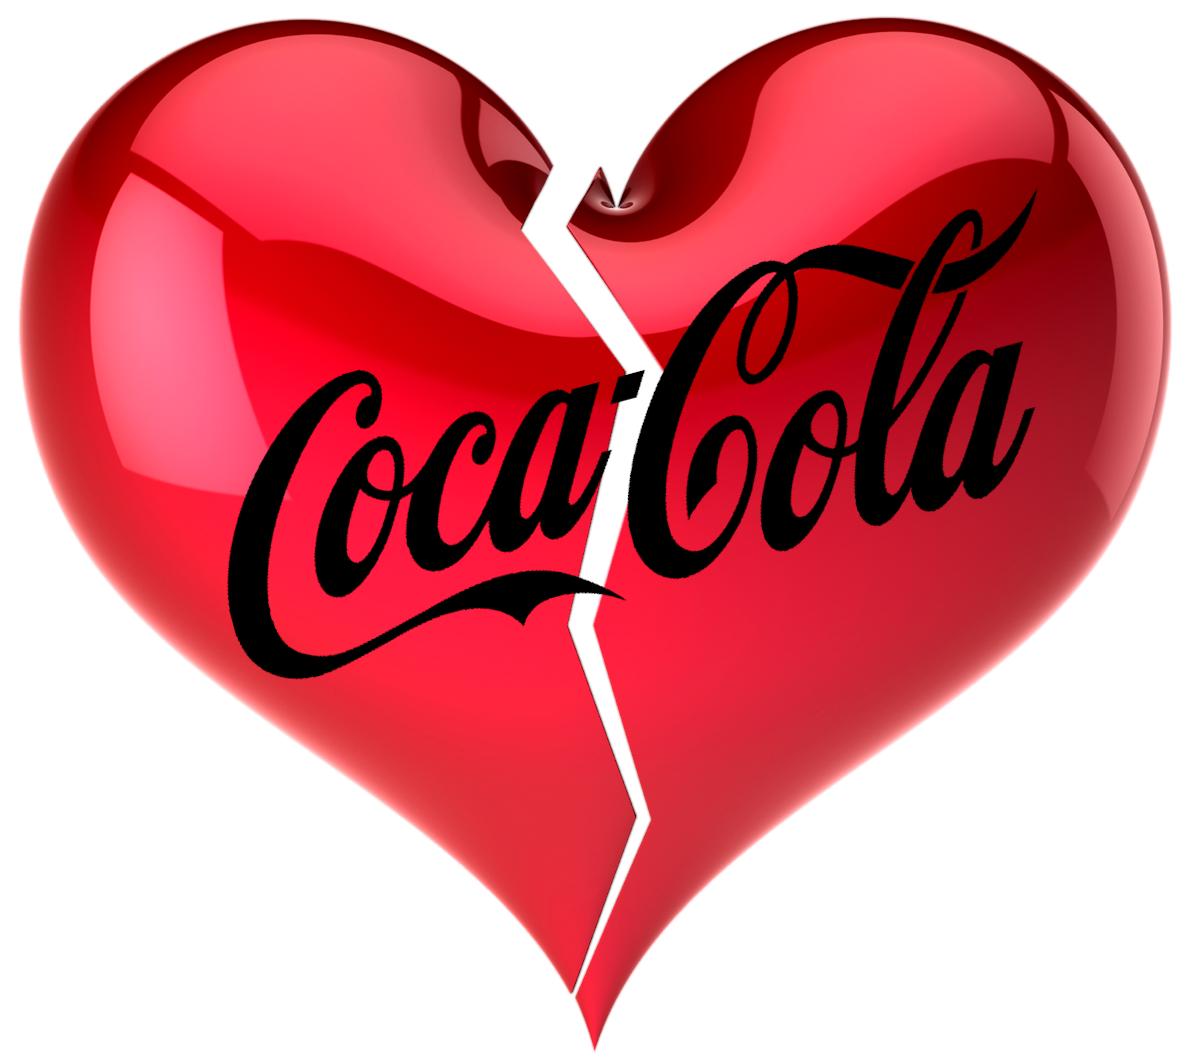 Am I Next? Coca-Cola Layoffs